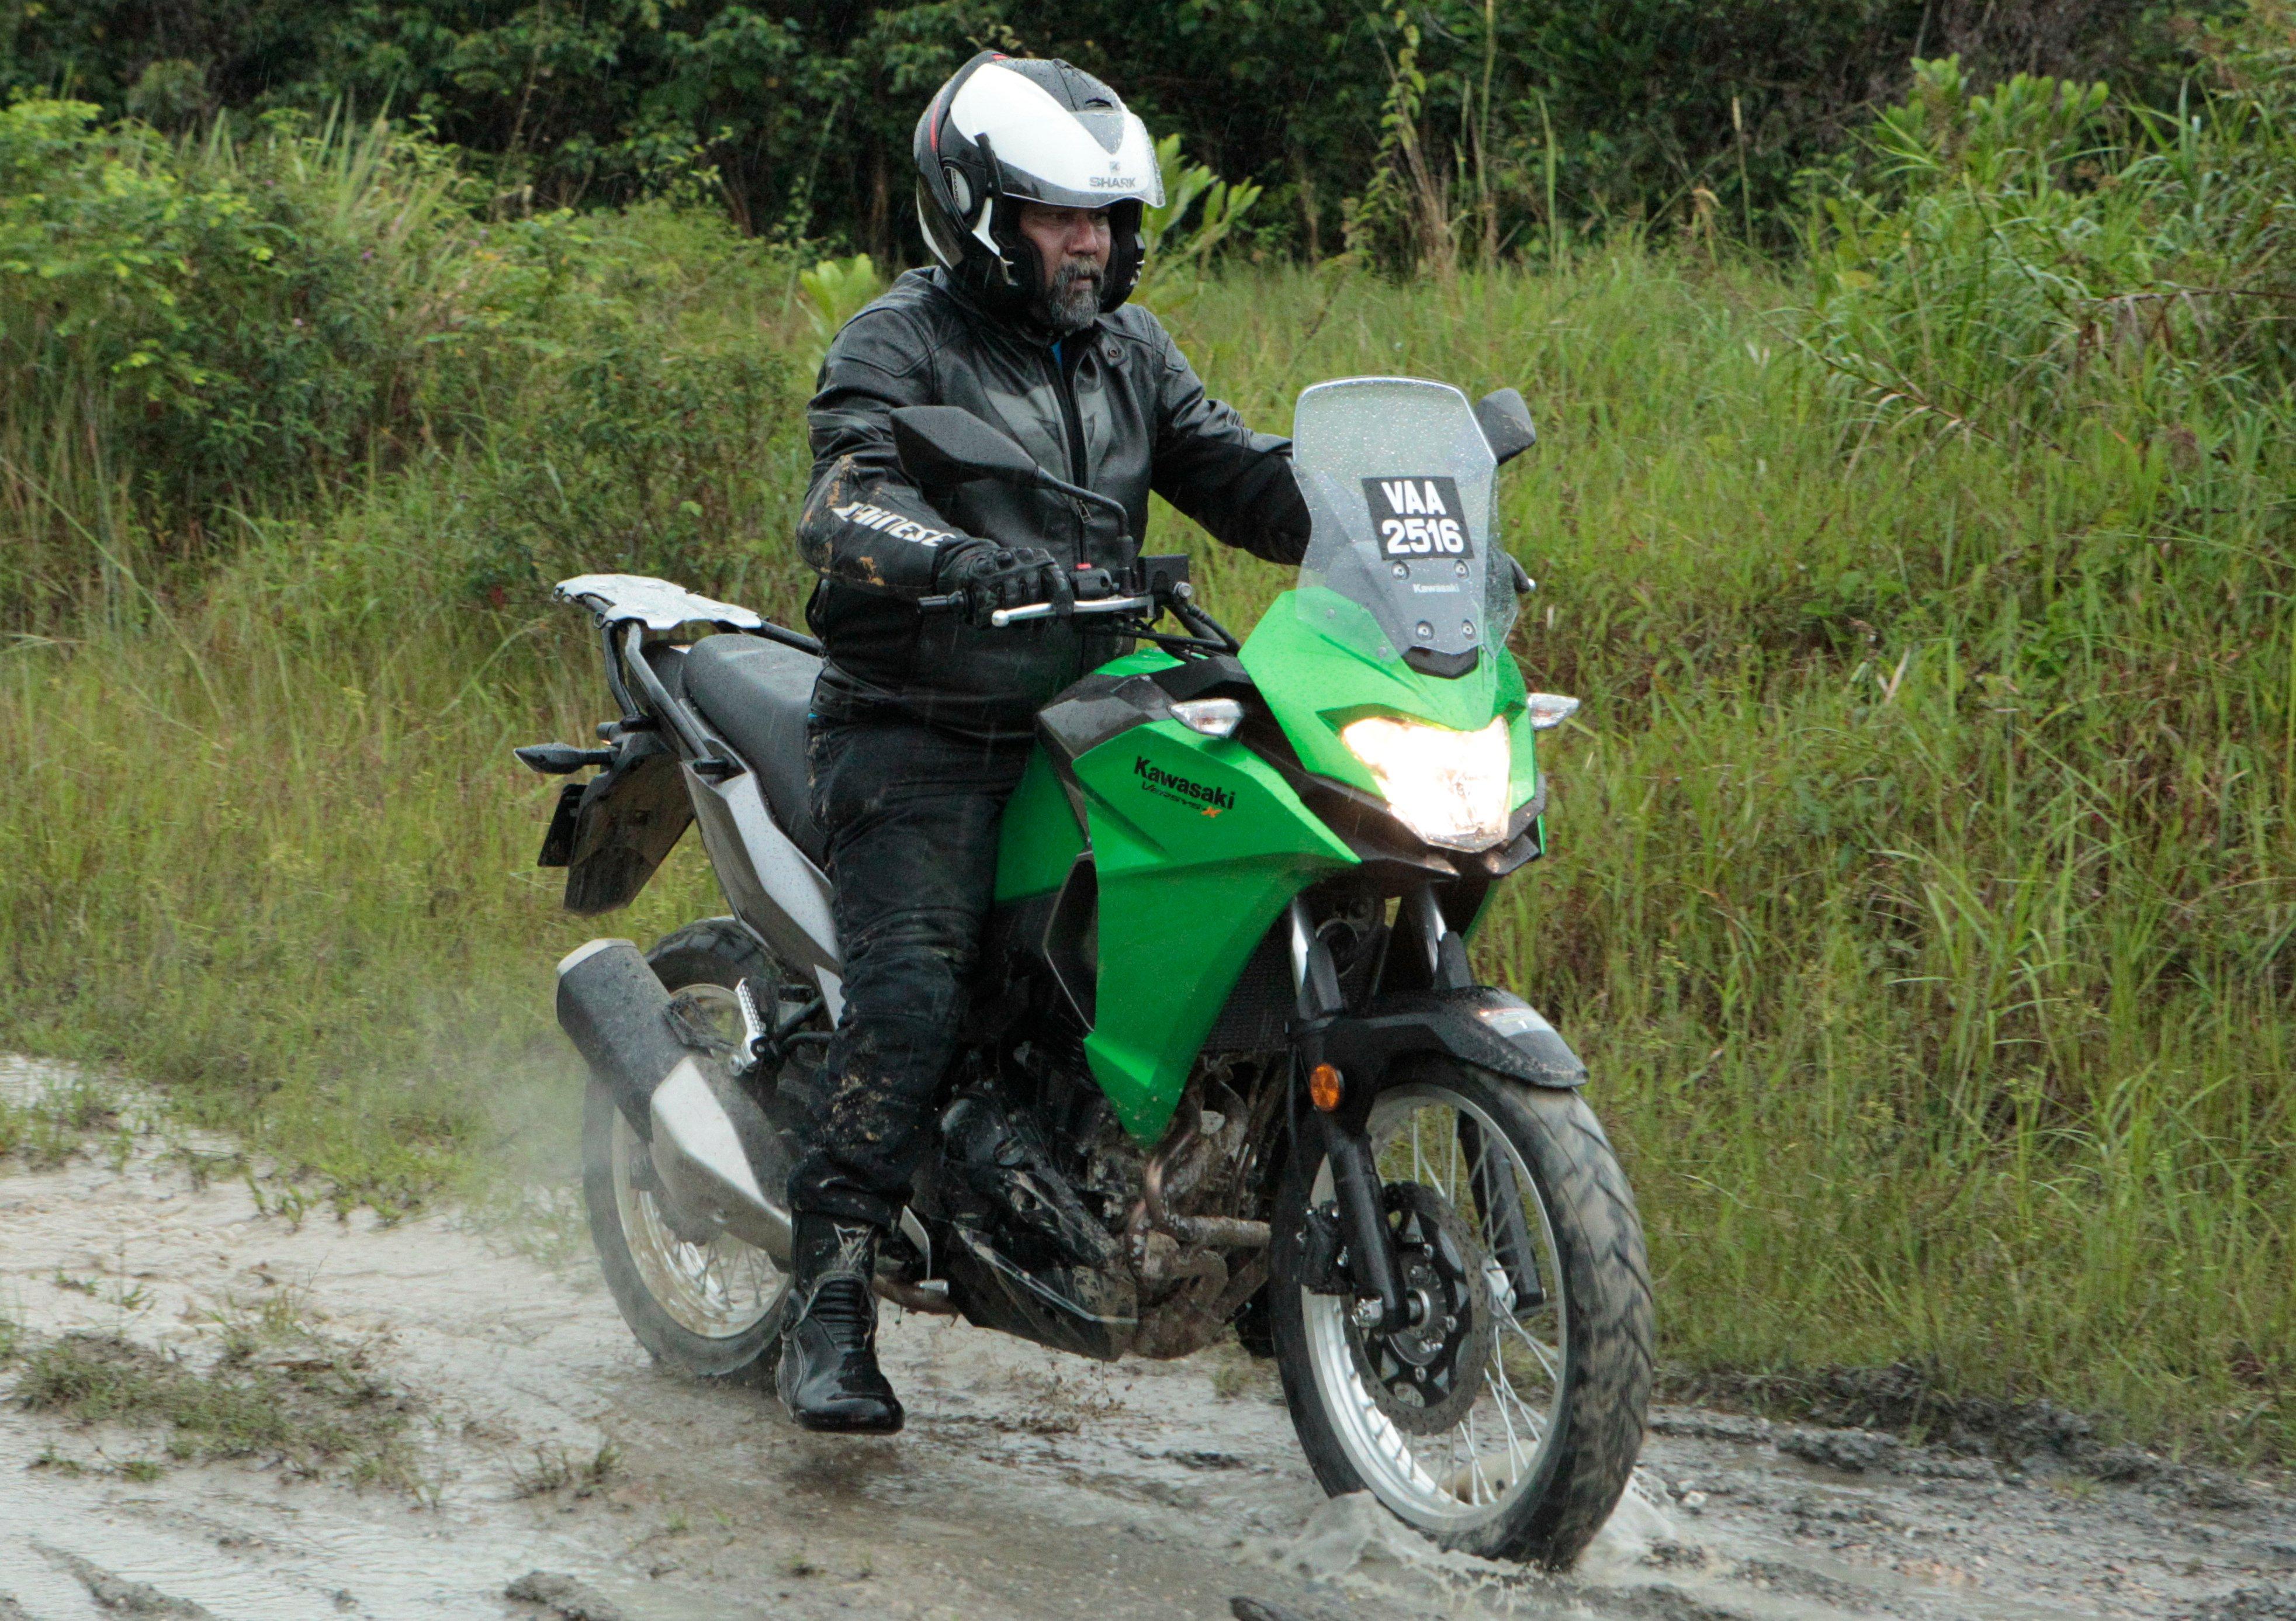 Kawasaki Dual Sport >> Ride impression: 2017 Kawasaki Versys X-250 – dual-purpose touring comes down to the quarter ...